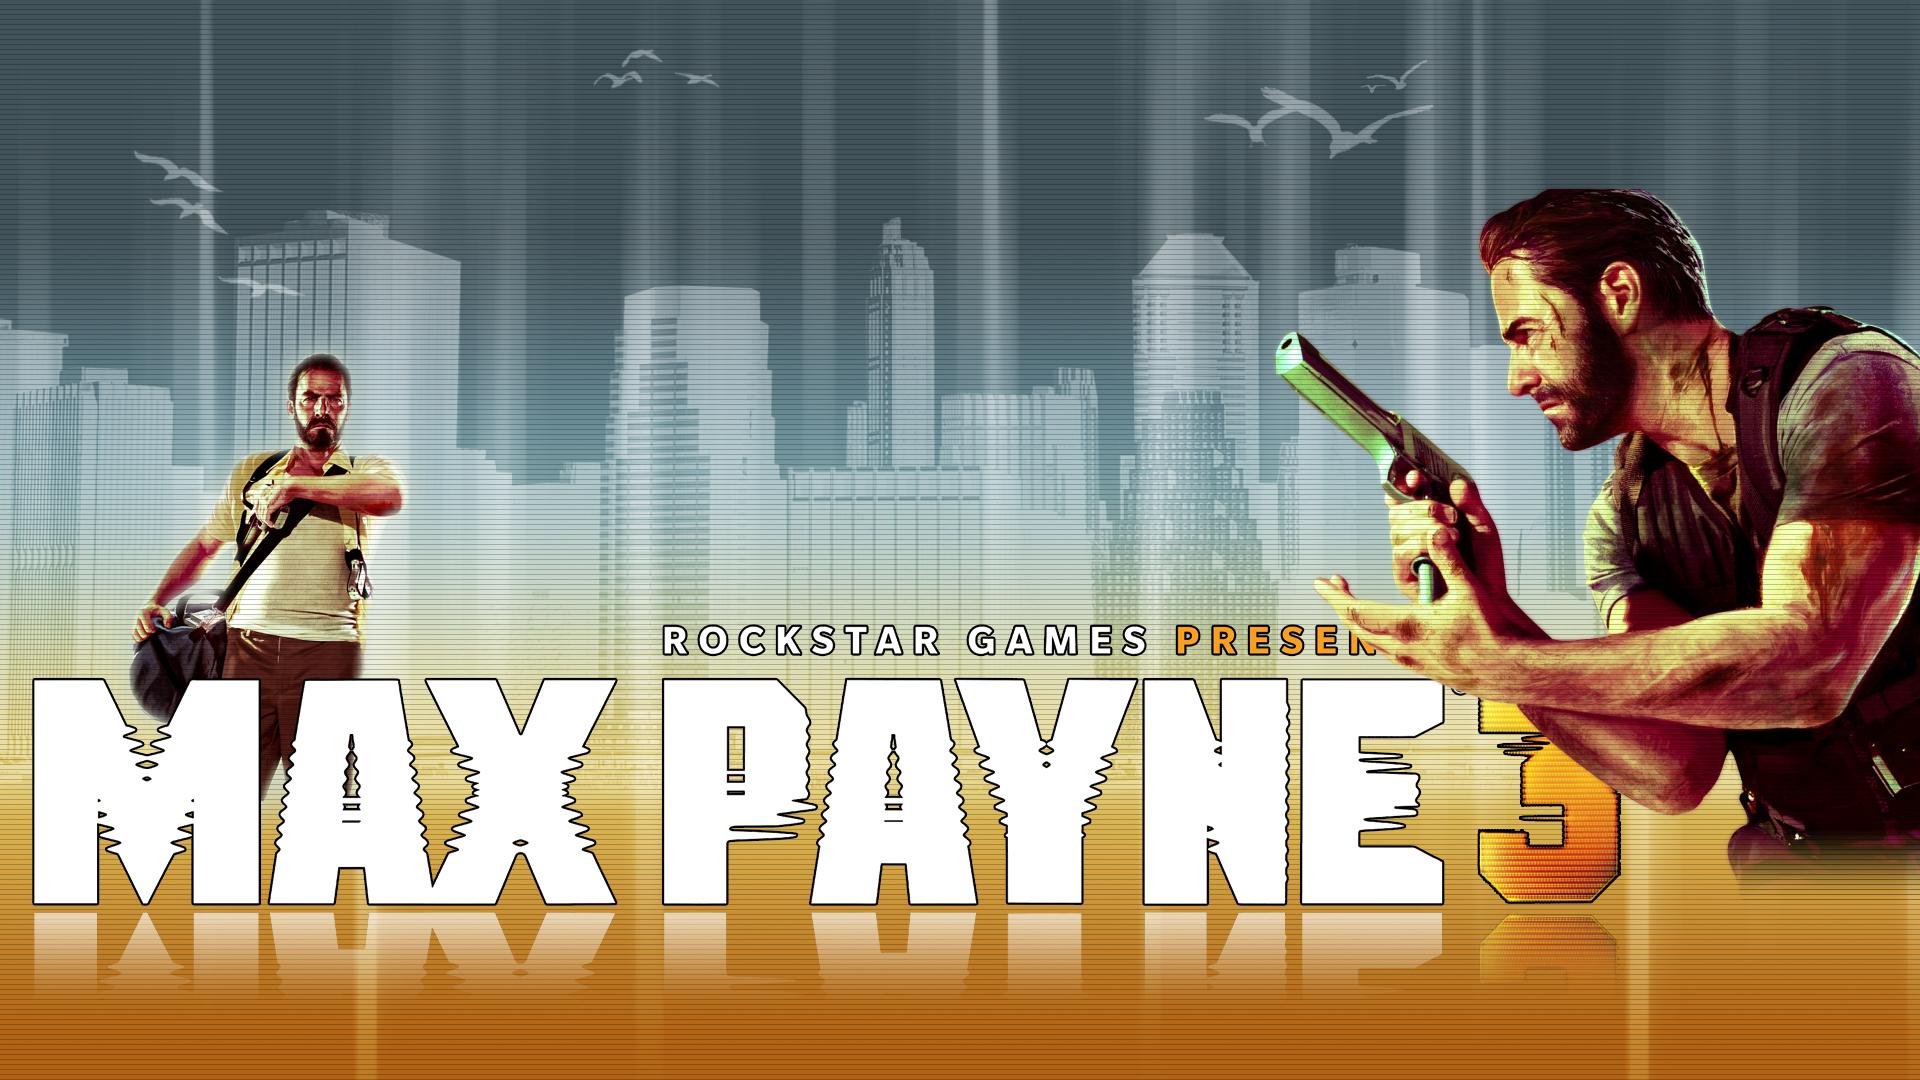 Max Payne 3 Wallpaper By Milosztor On Deviantart